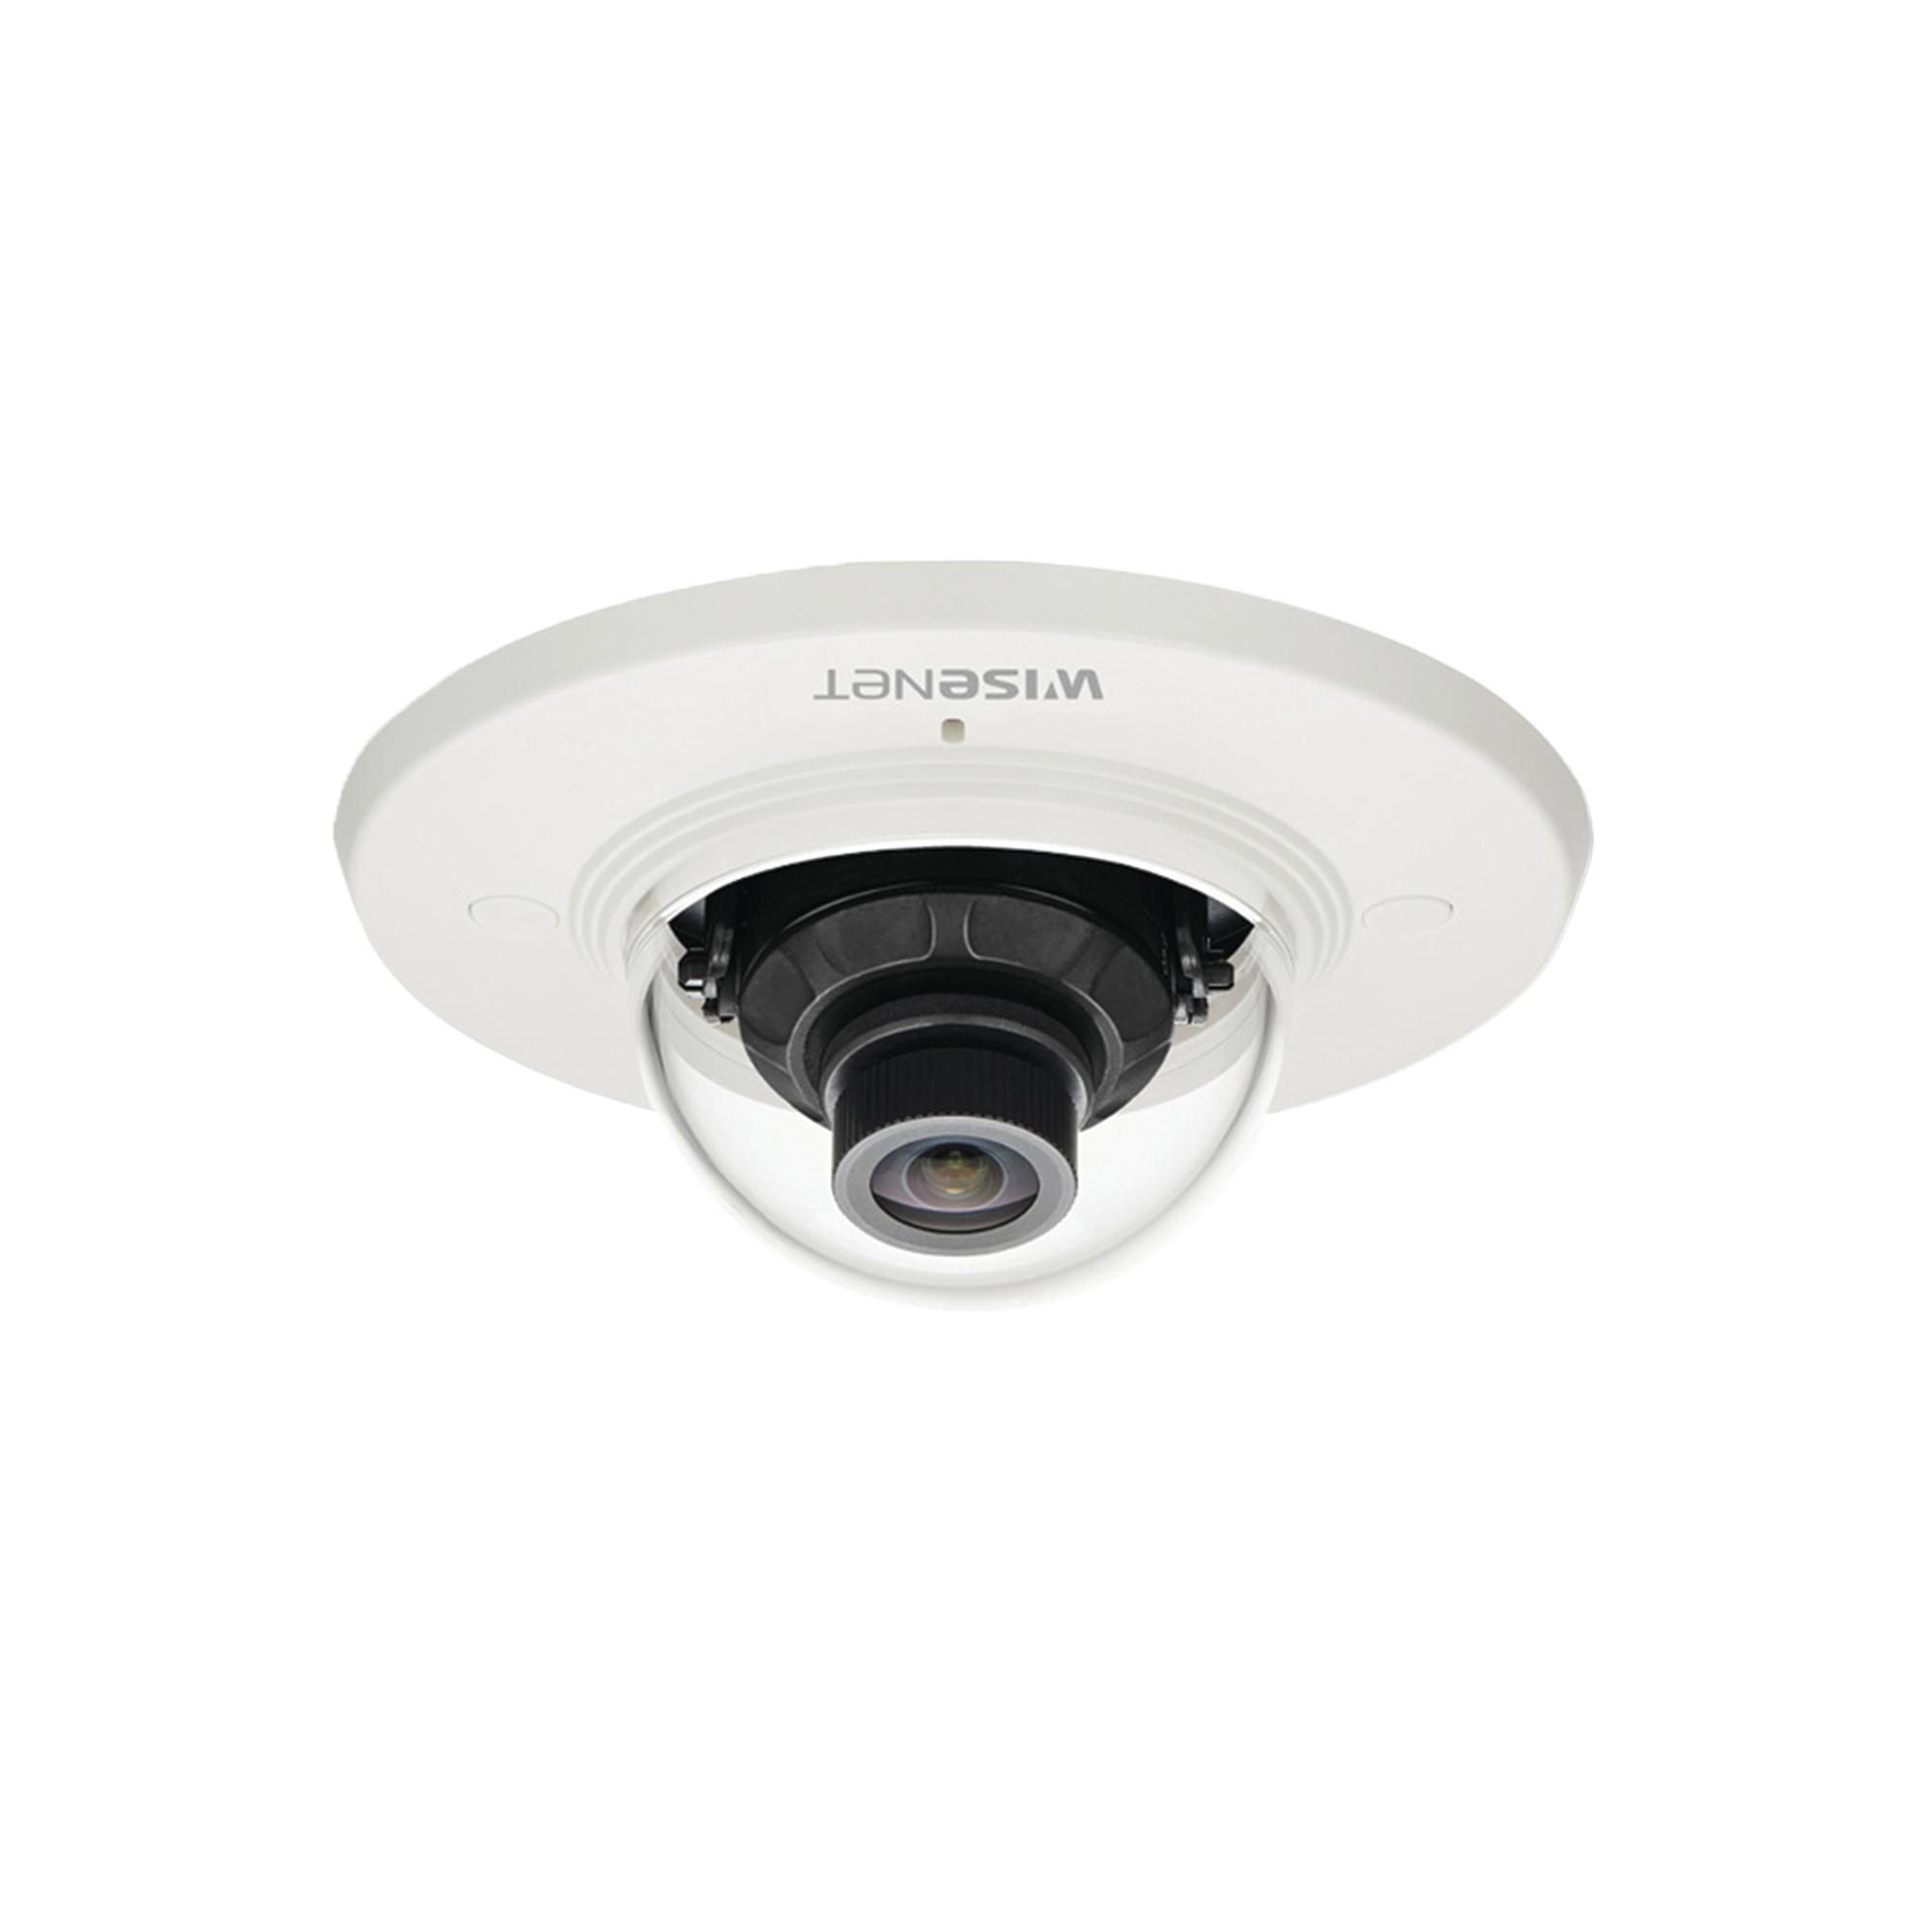 Cámara IP Tipo Domo Interior para Plafon 5MP / Lente 3.7mm / WDR 120db / H.265 & WiseStream